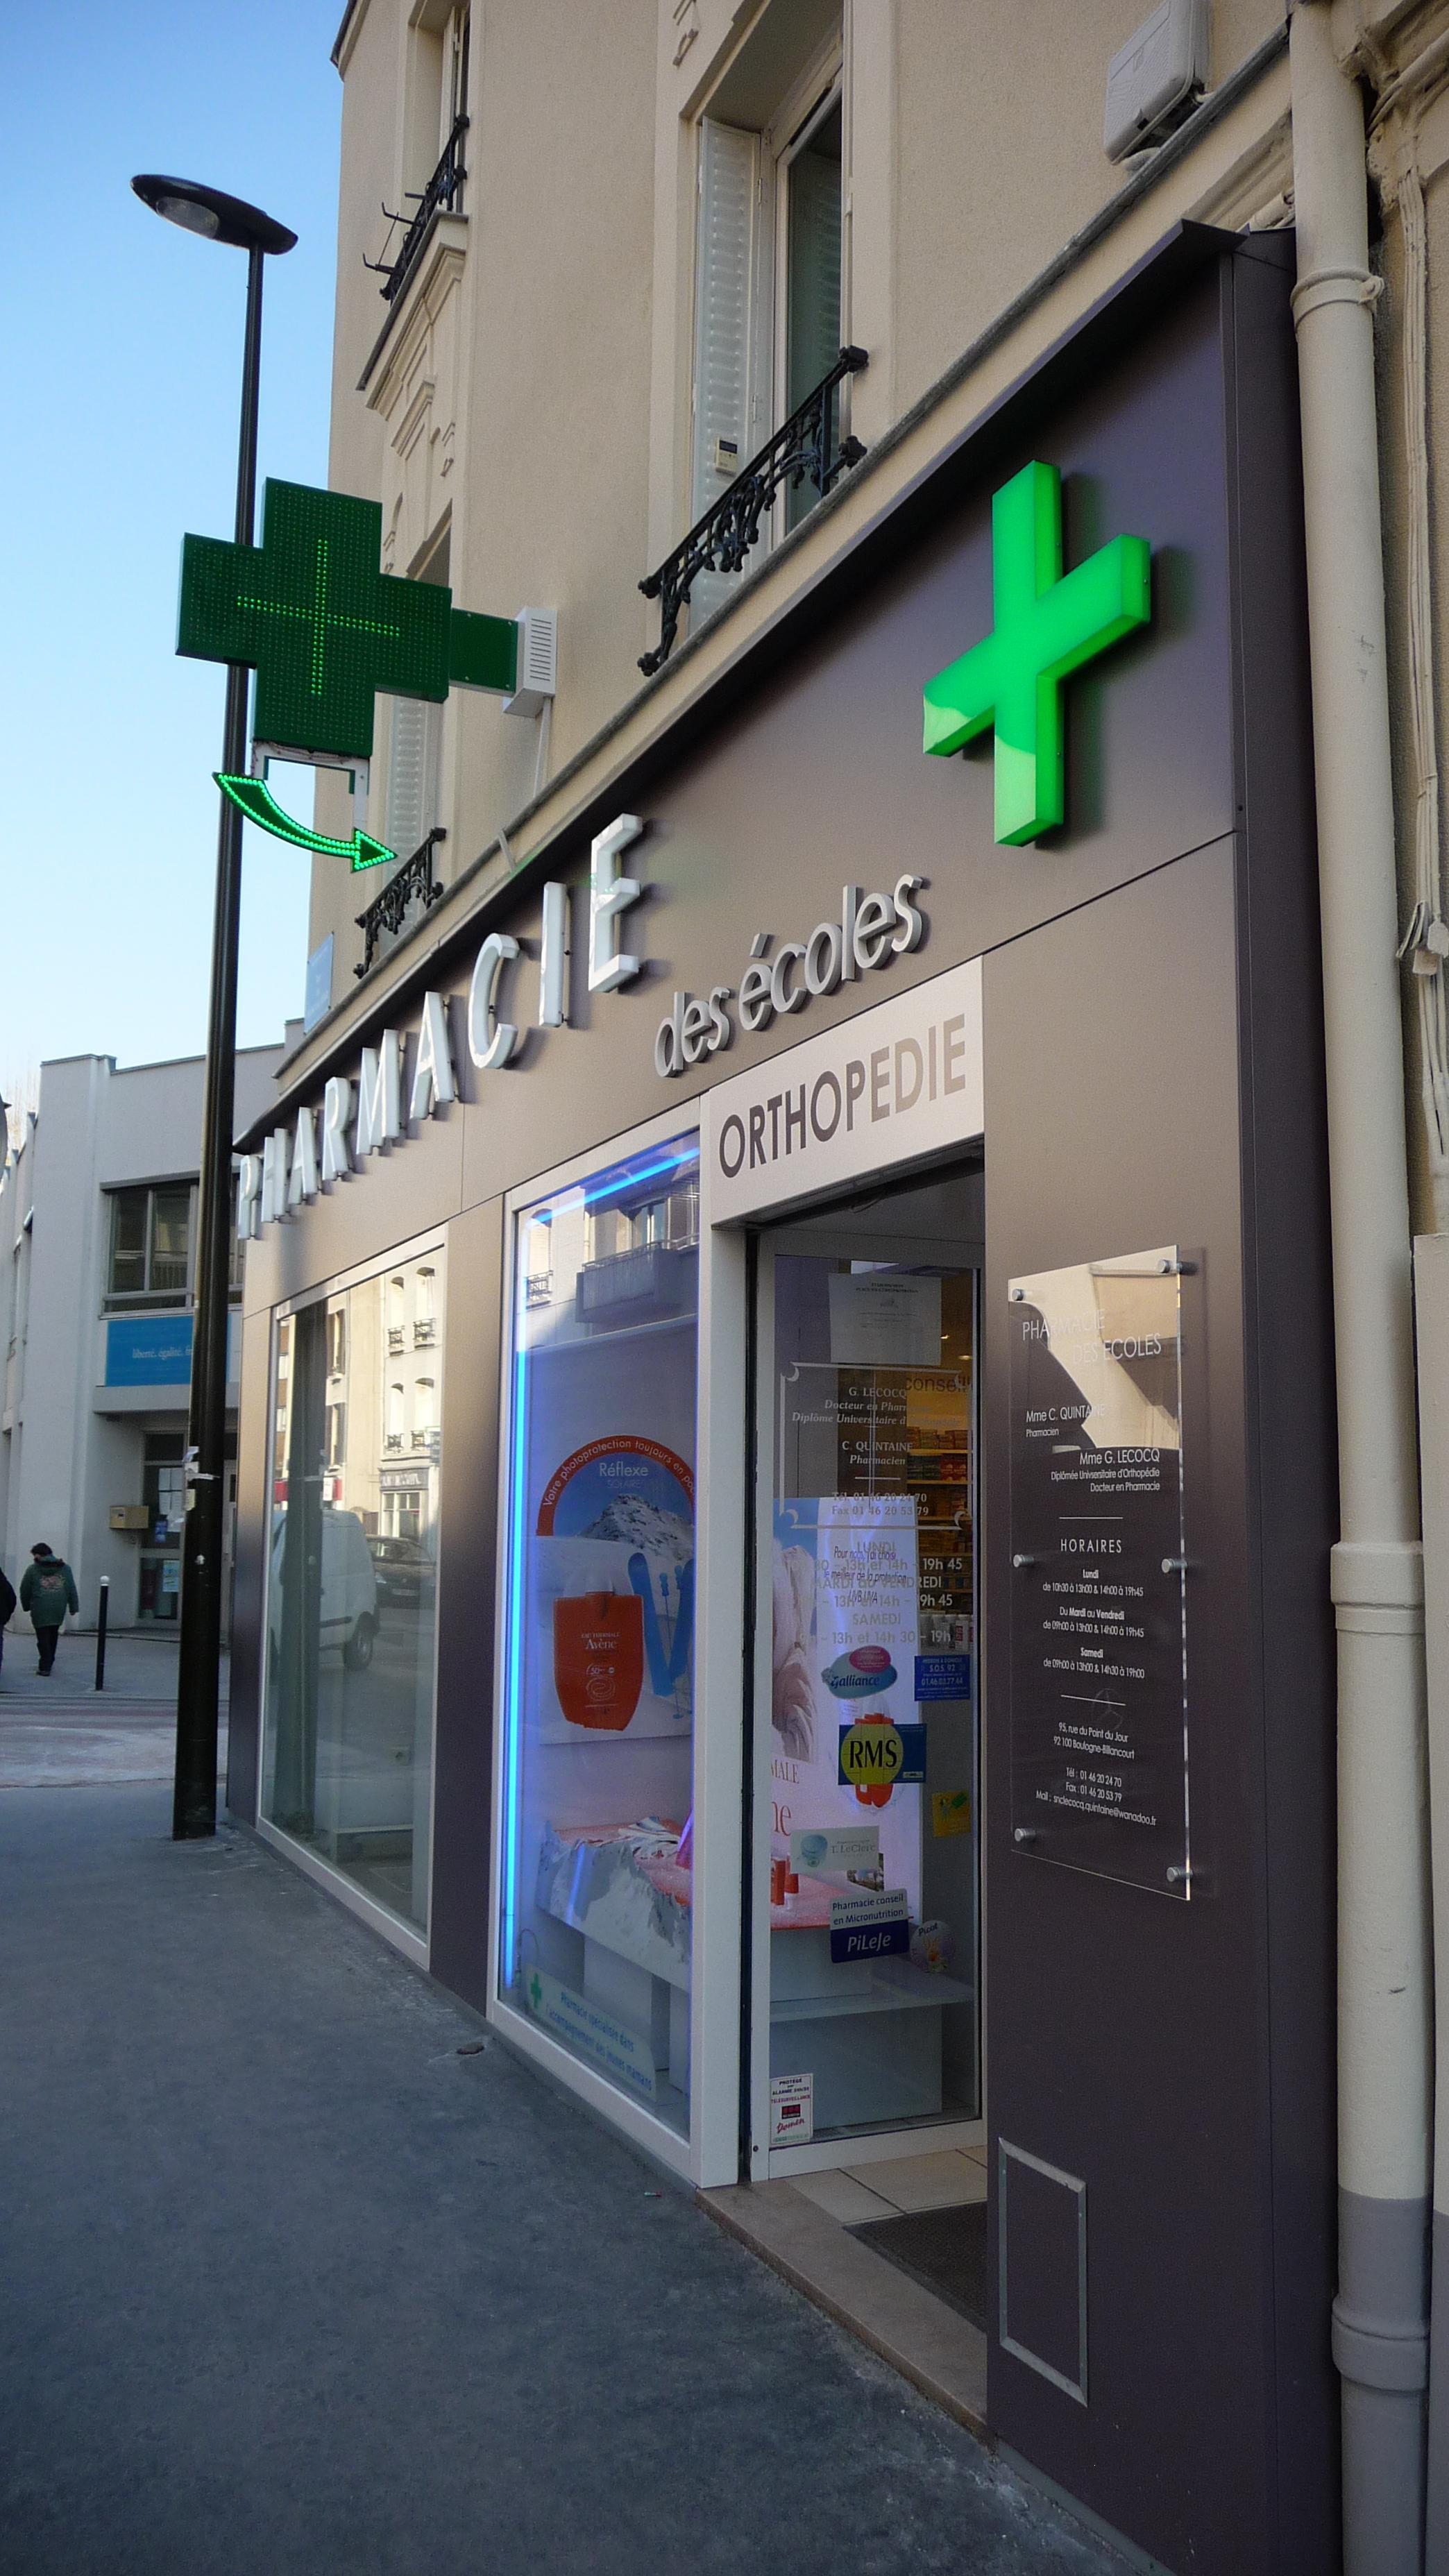 Pharmacie Boulogne